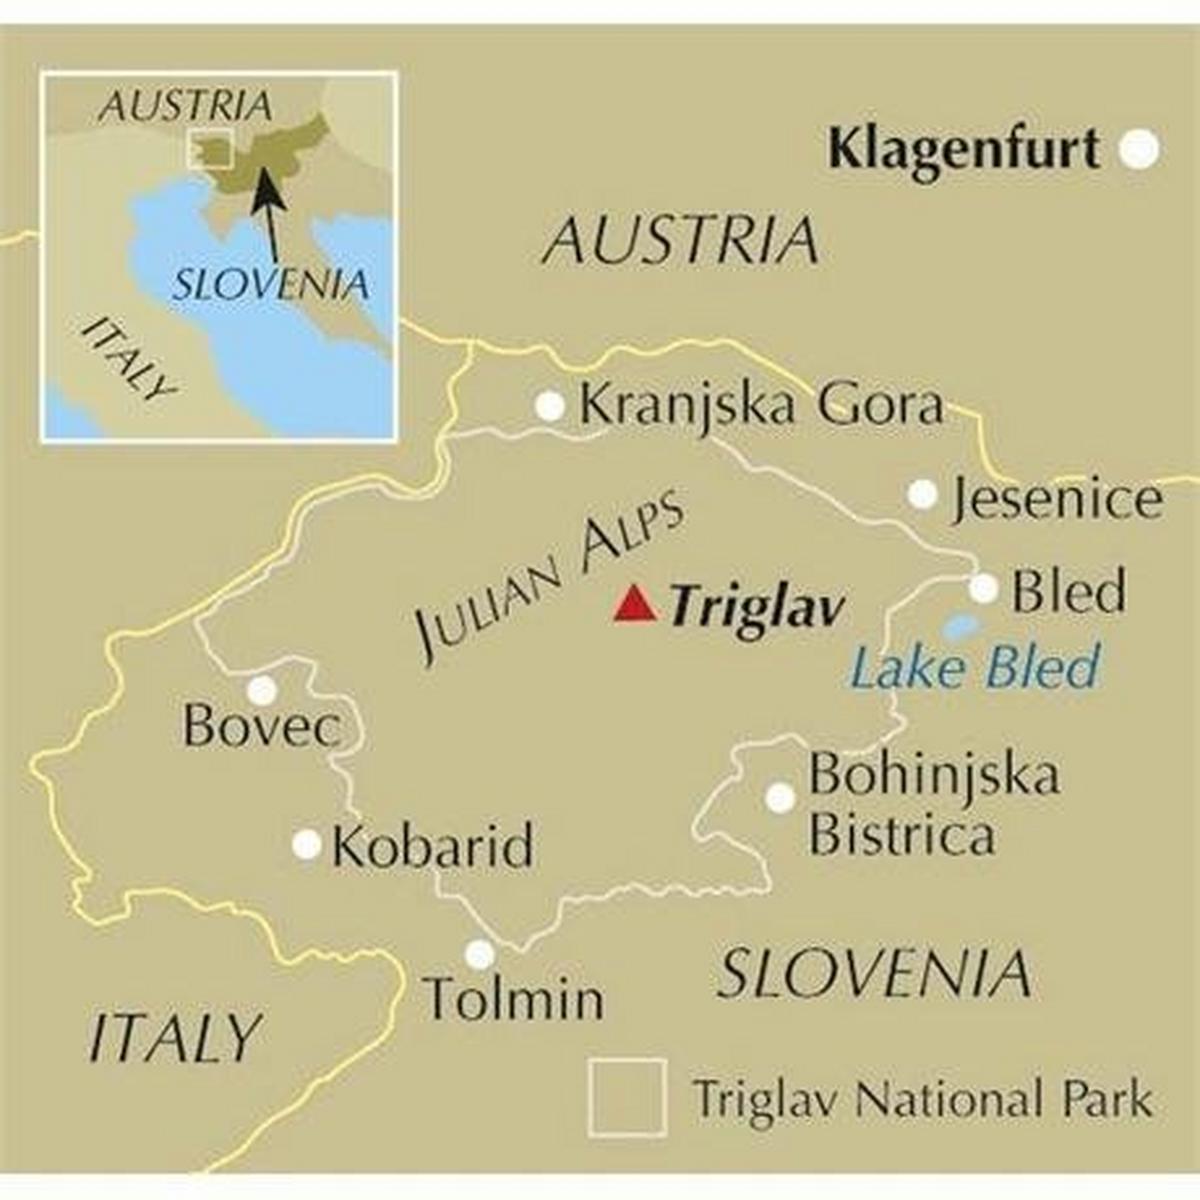 Cicerone Guide Book: The Julian Alps of Slovenia